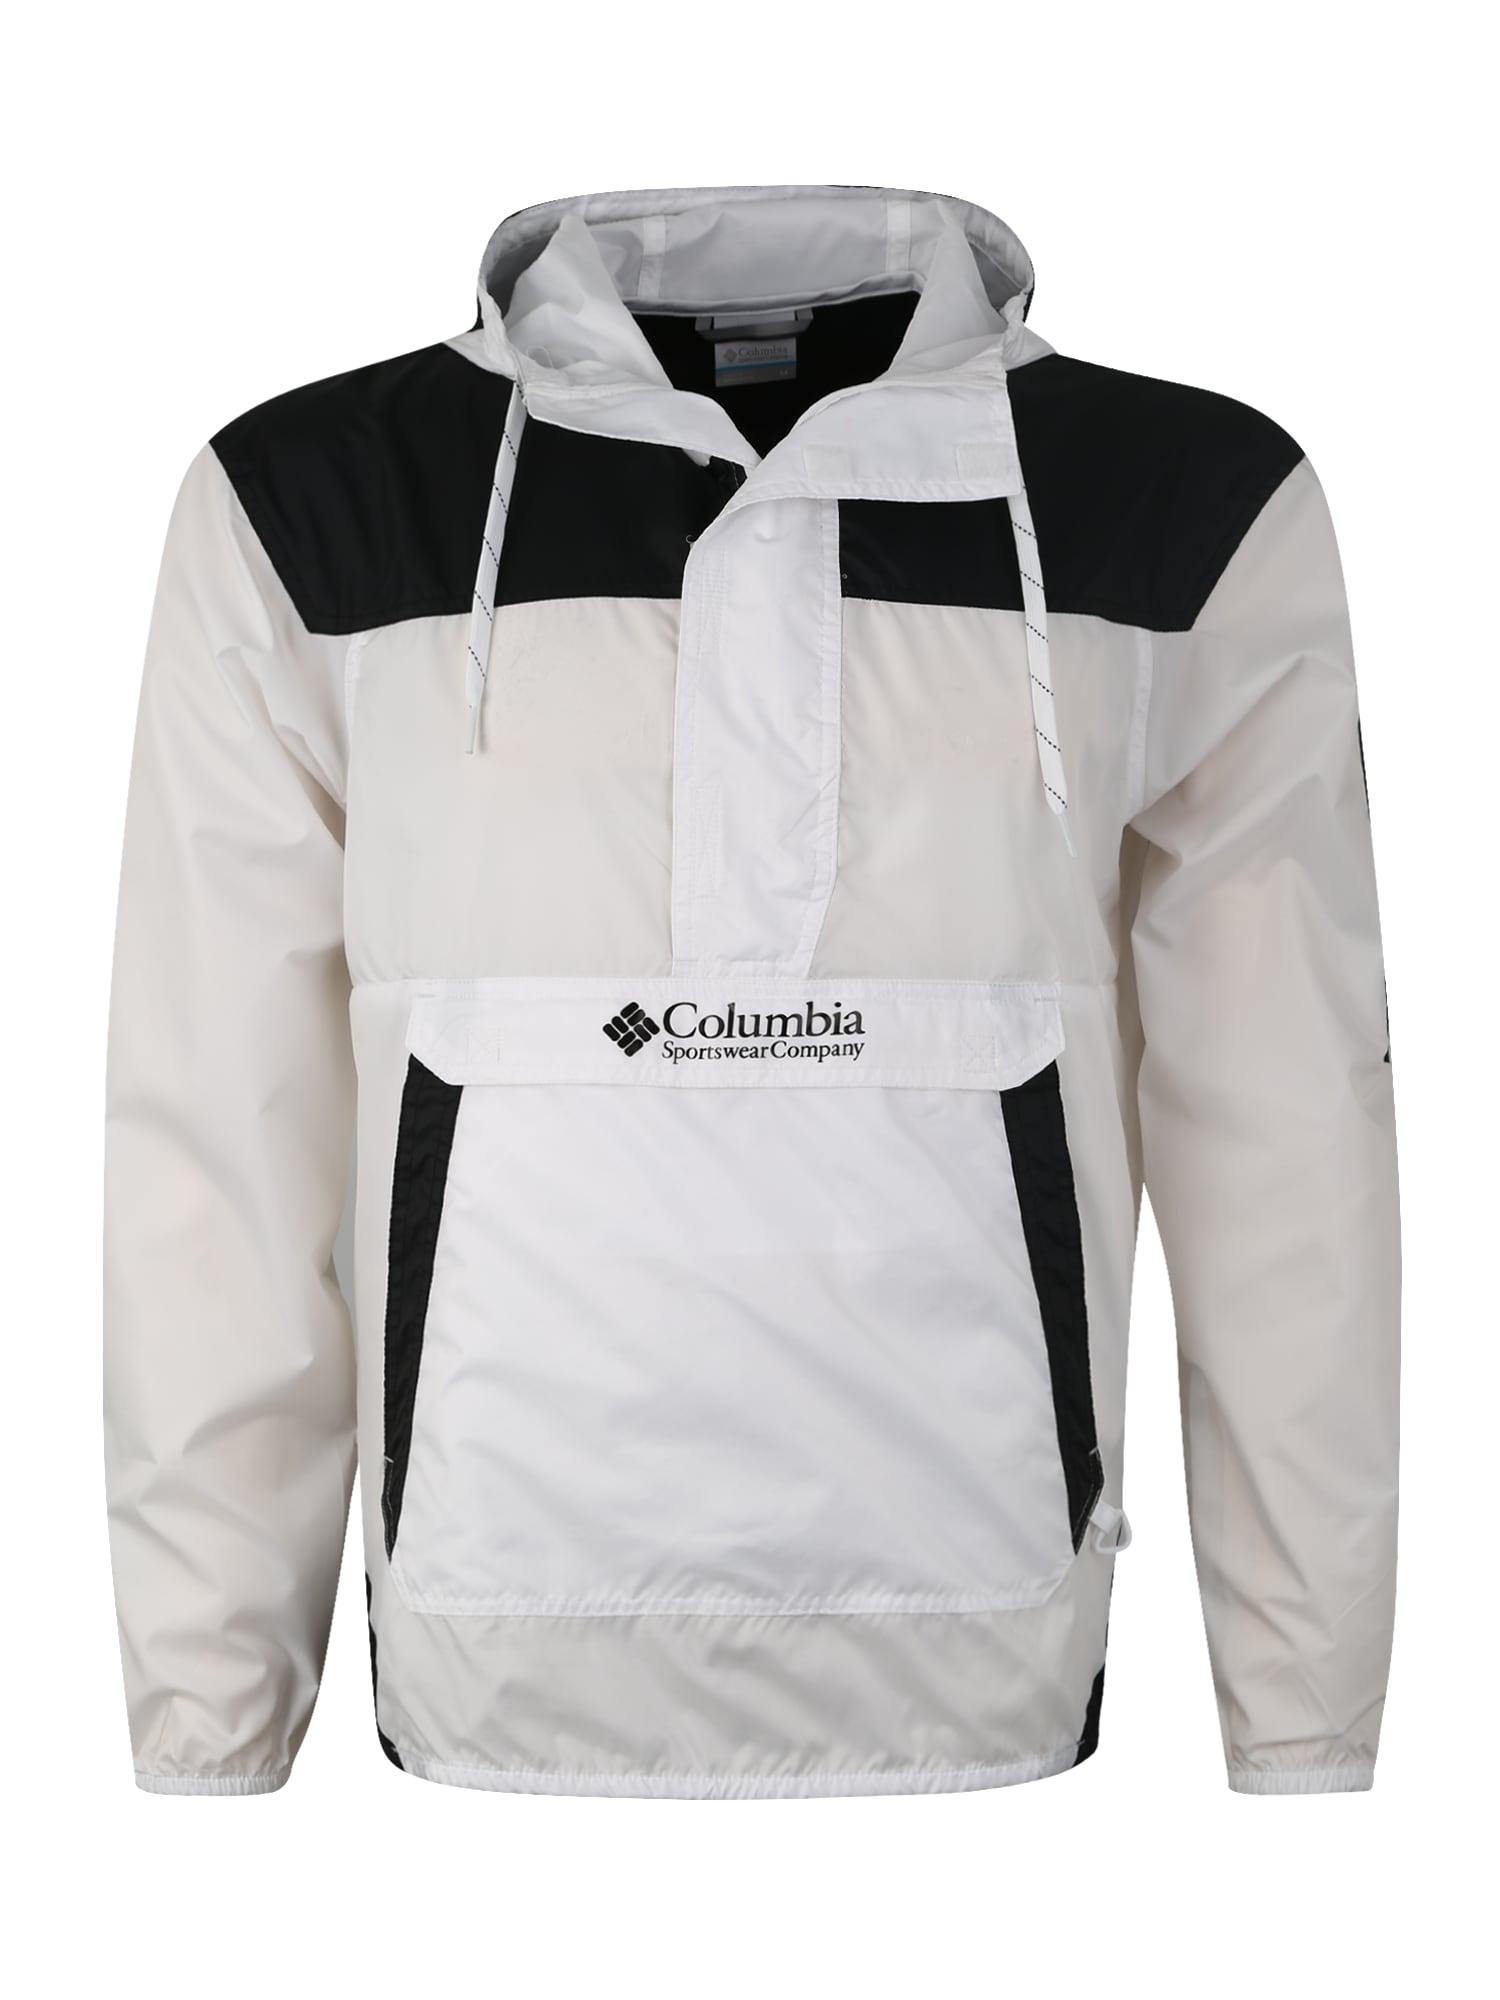 Outdoorová bunda Challenger černá bílá COLUMBIA